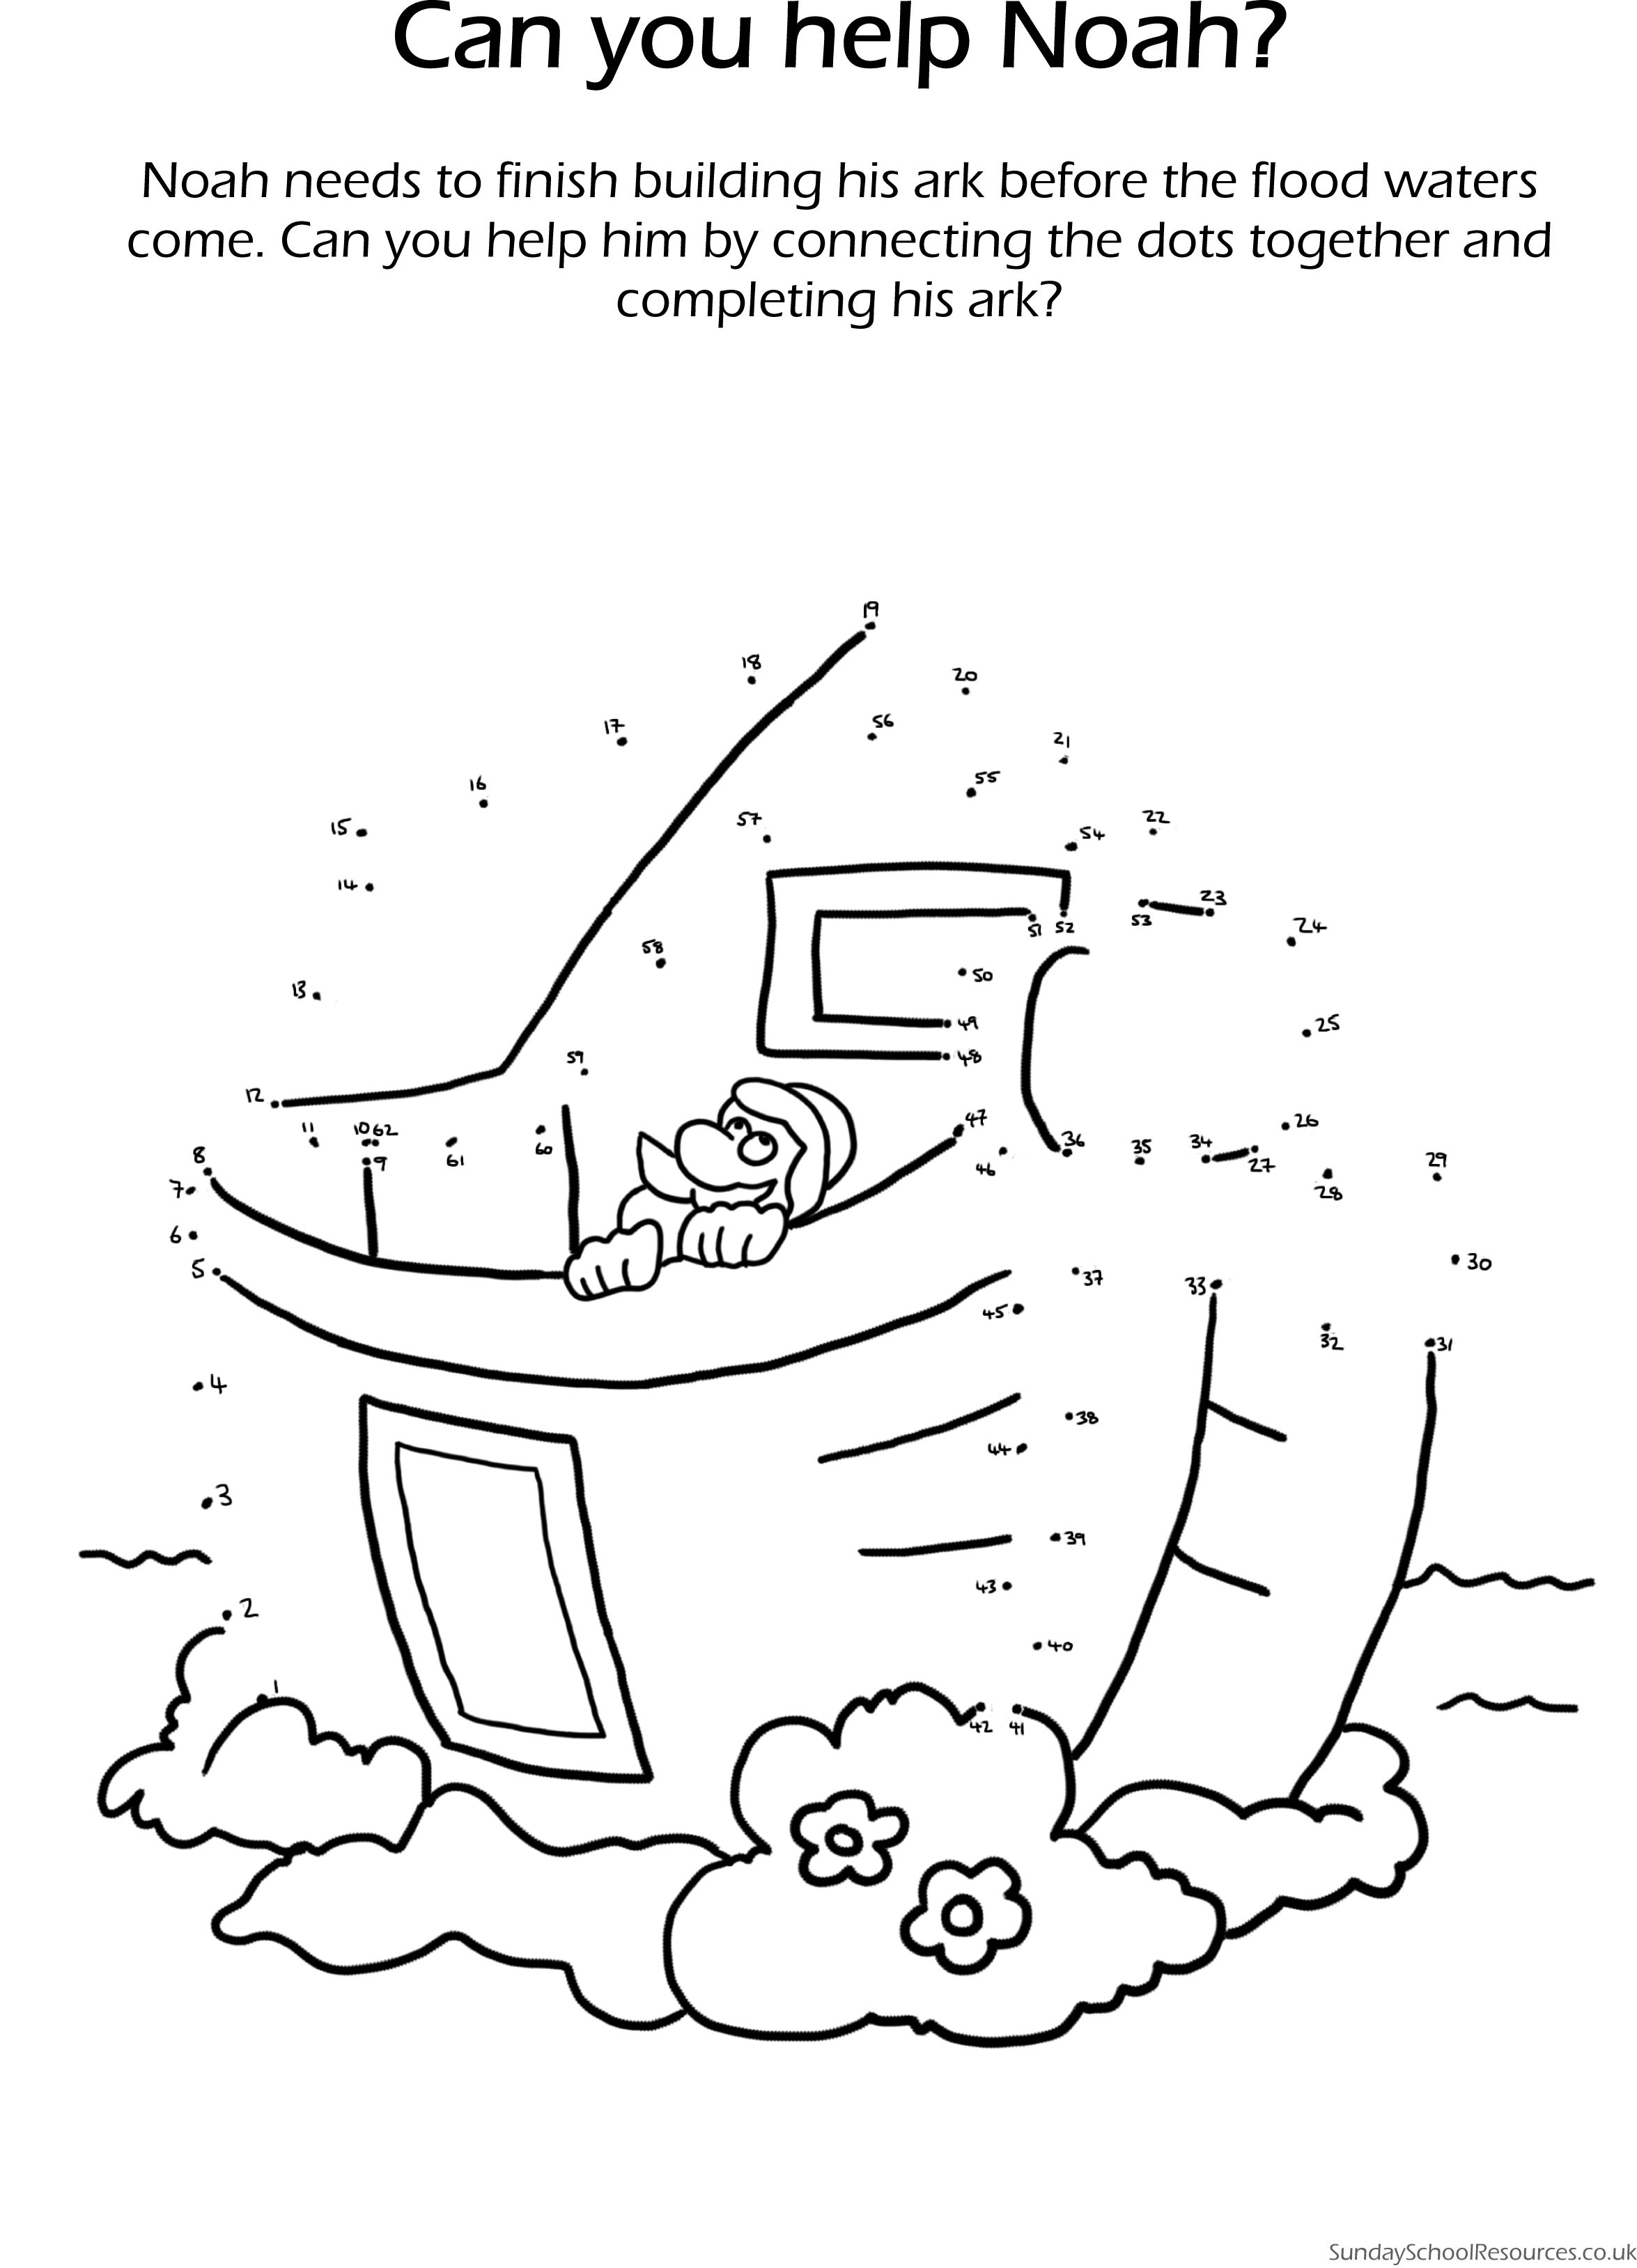 Noah The Ark Dot To Dot Sunday School Worksheet Sunday